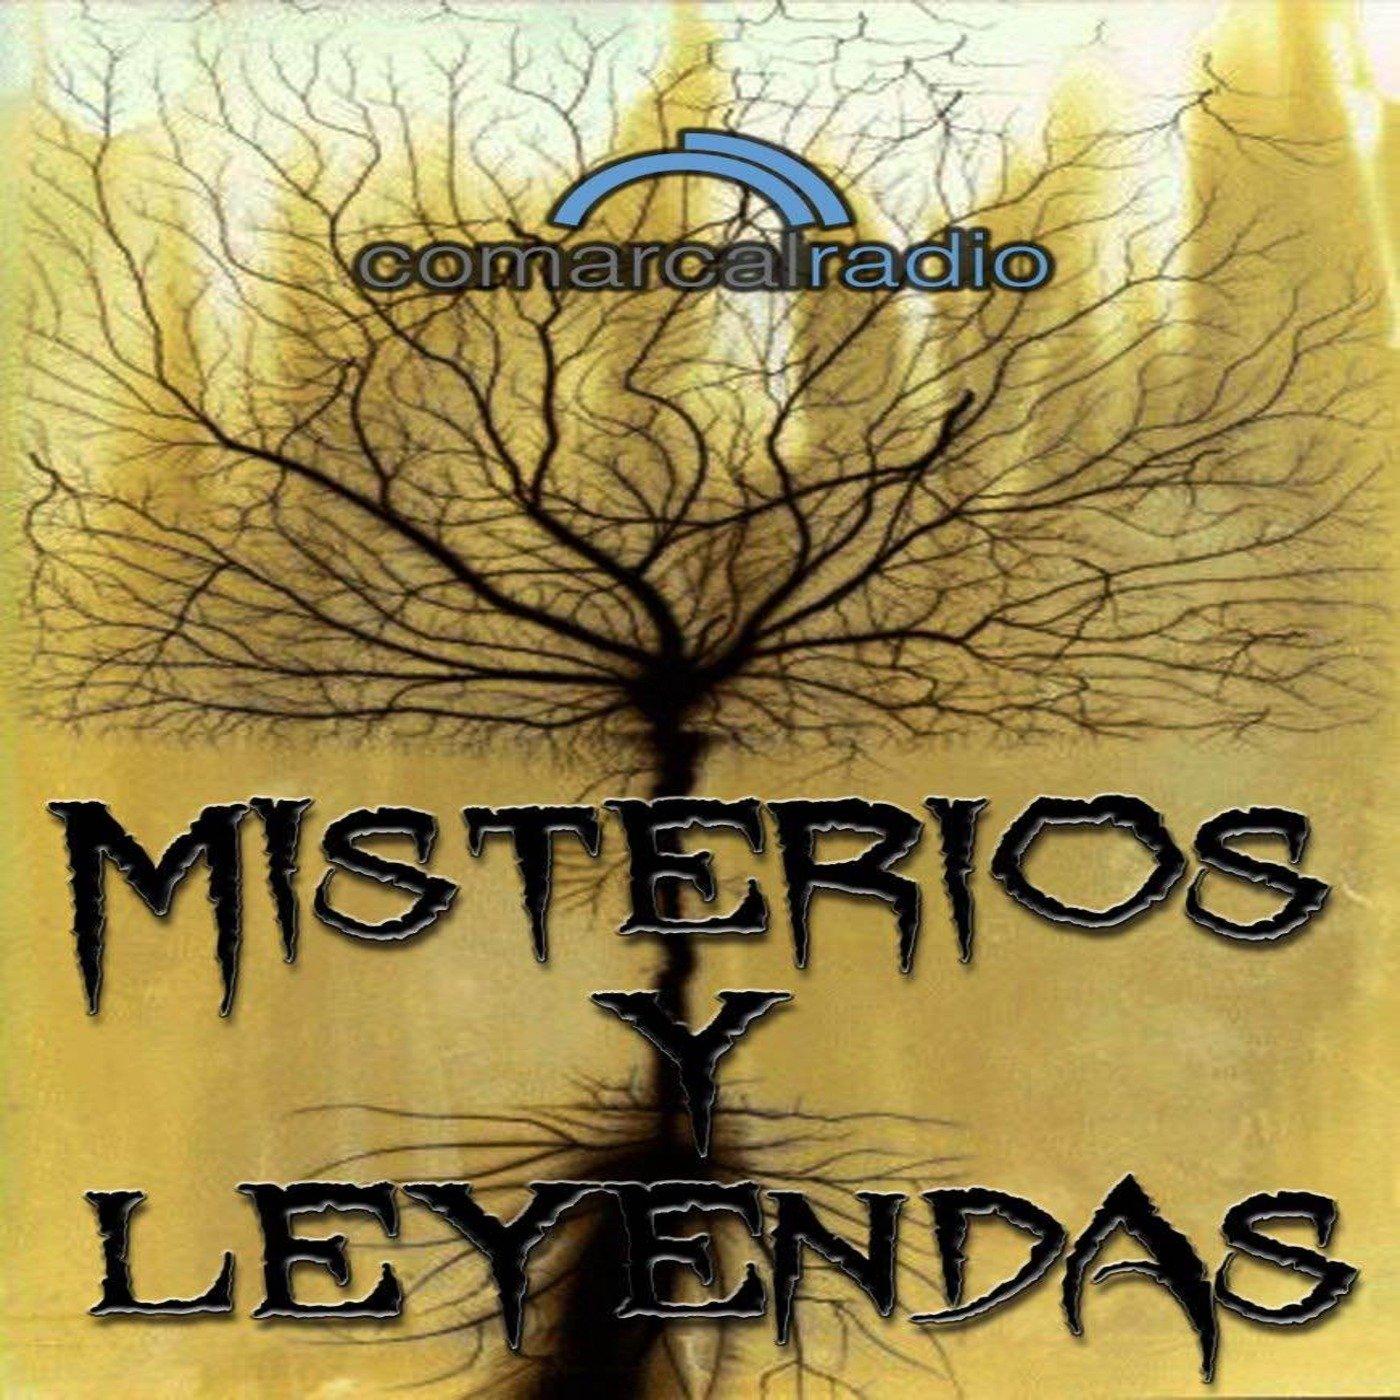 leyendas de misterio